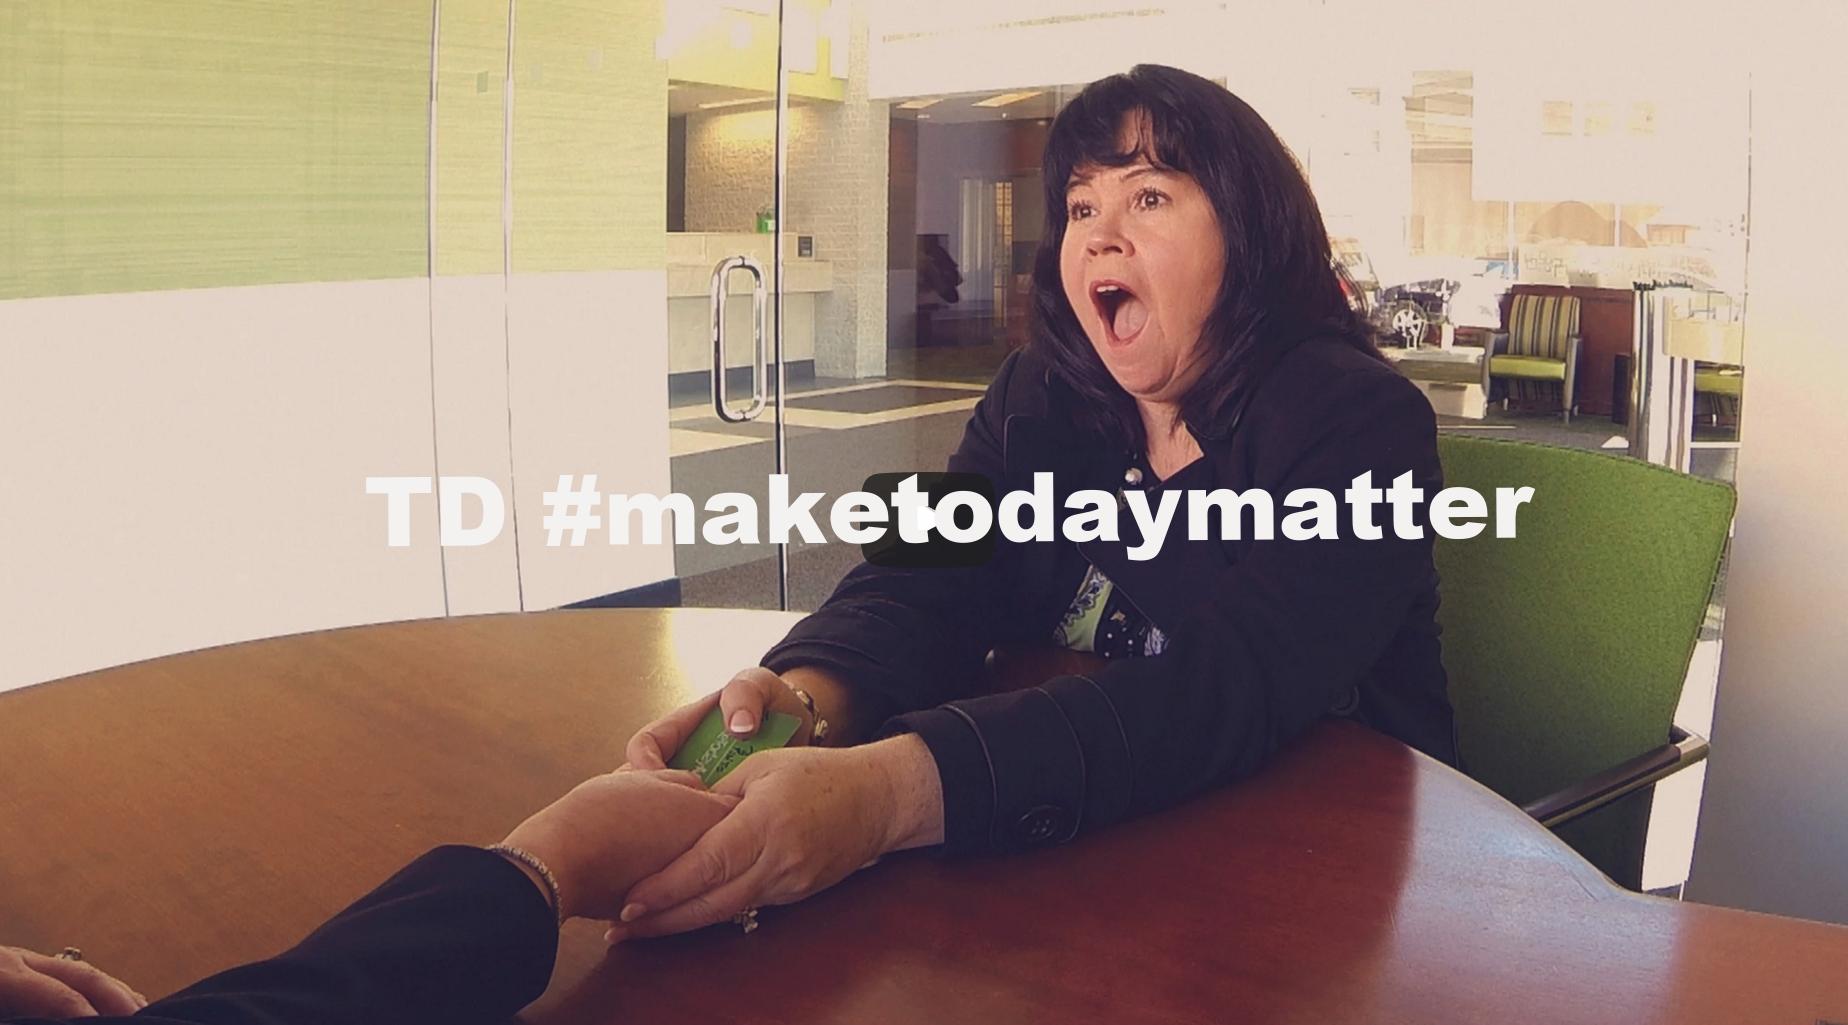 TD #Maketodaymatter